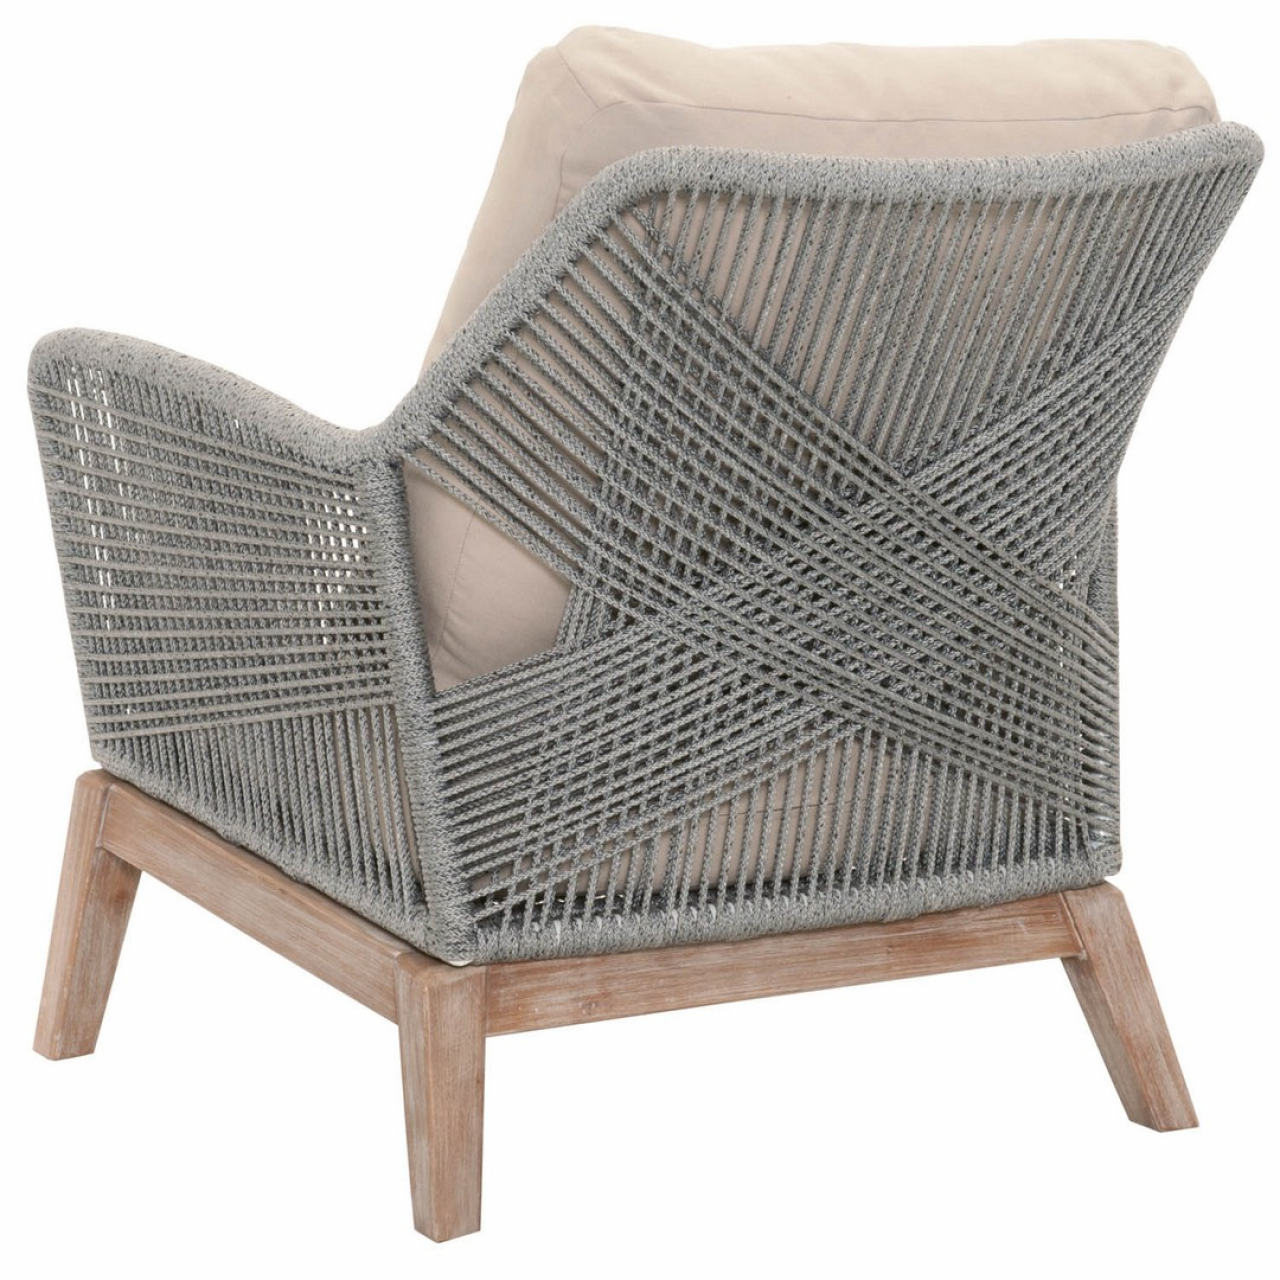 Loom+Club+Chair+-+Platinum+-+4.jpg